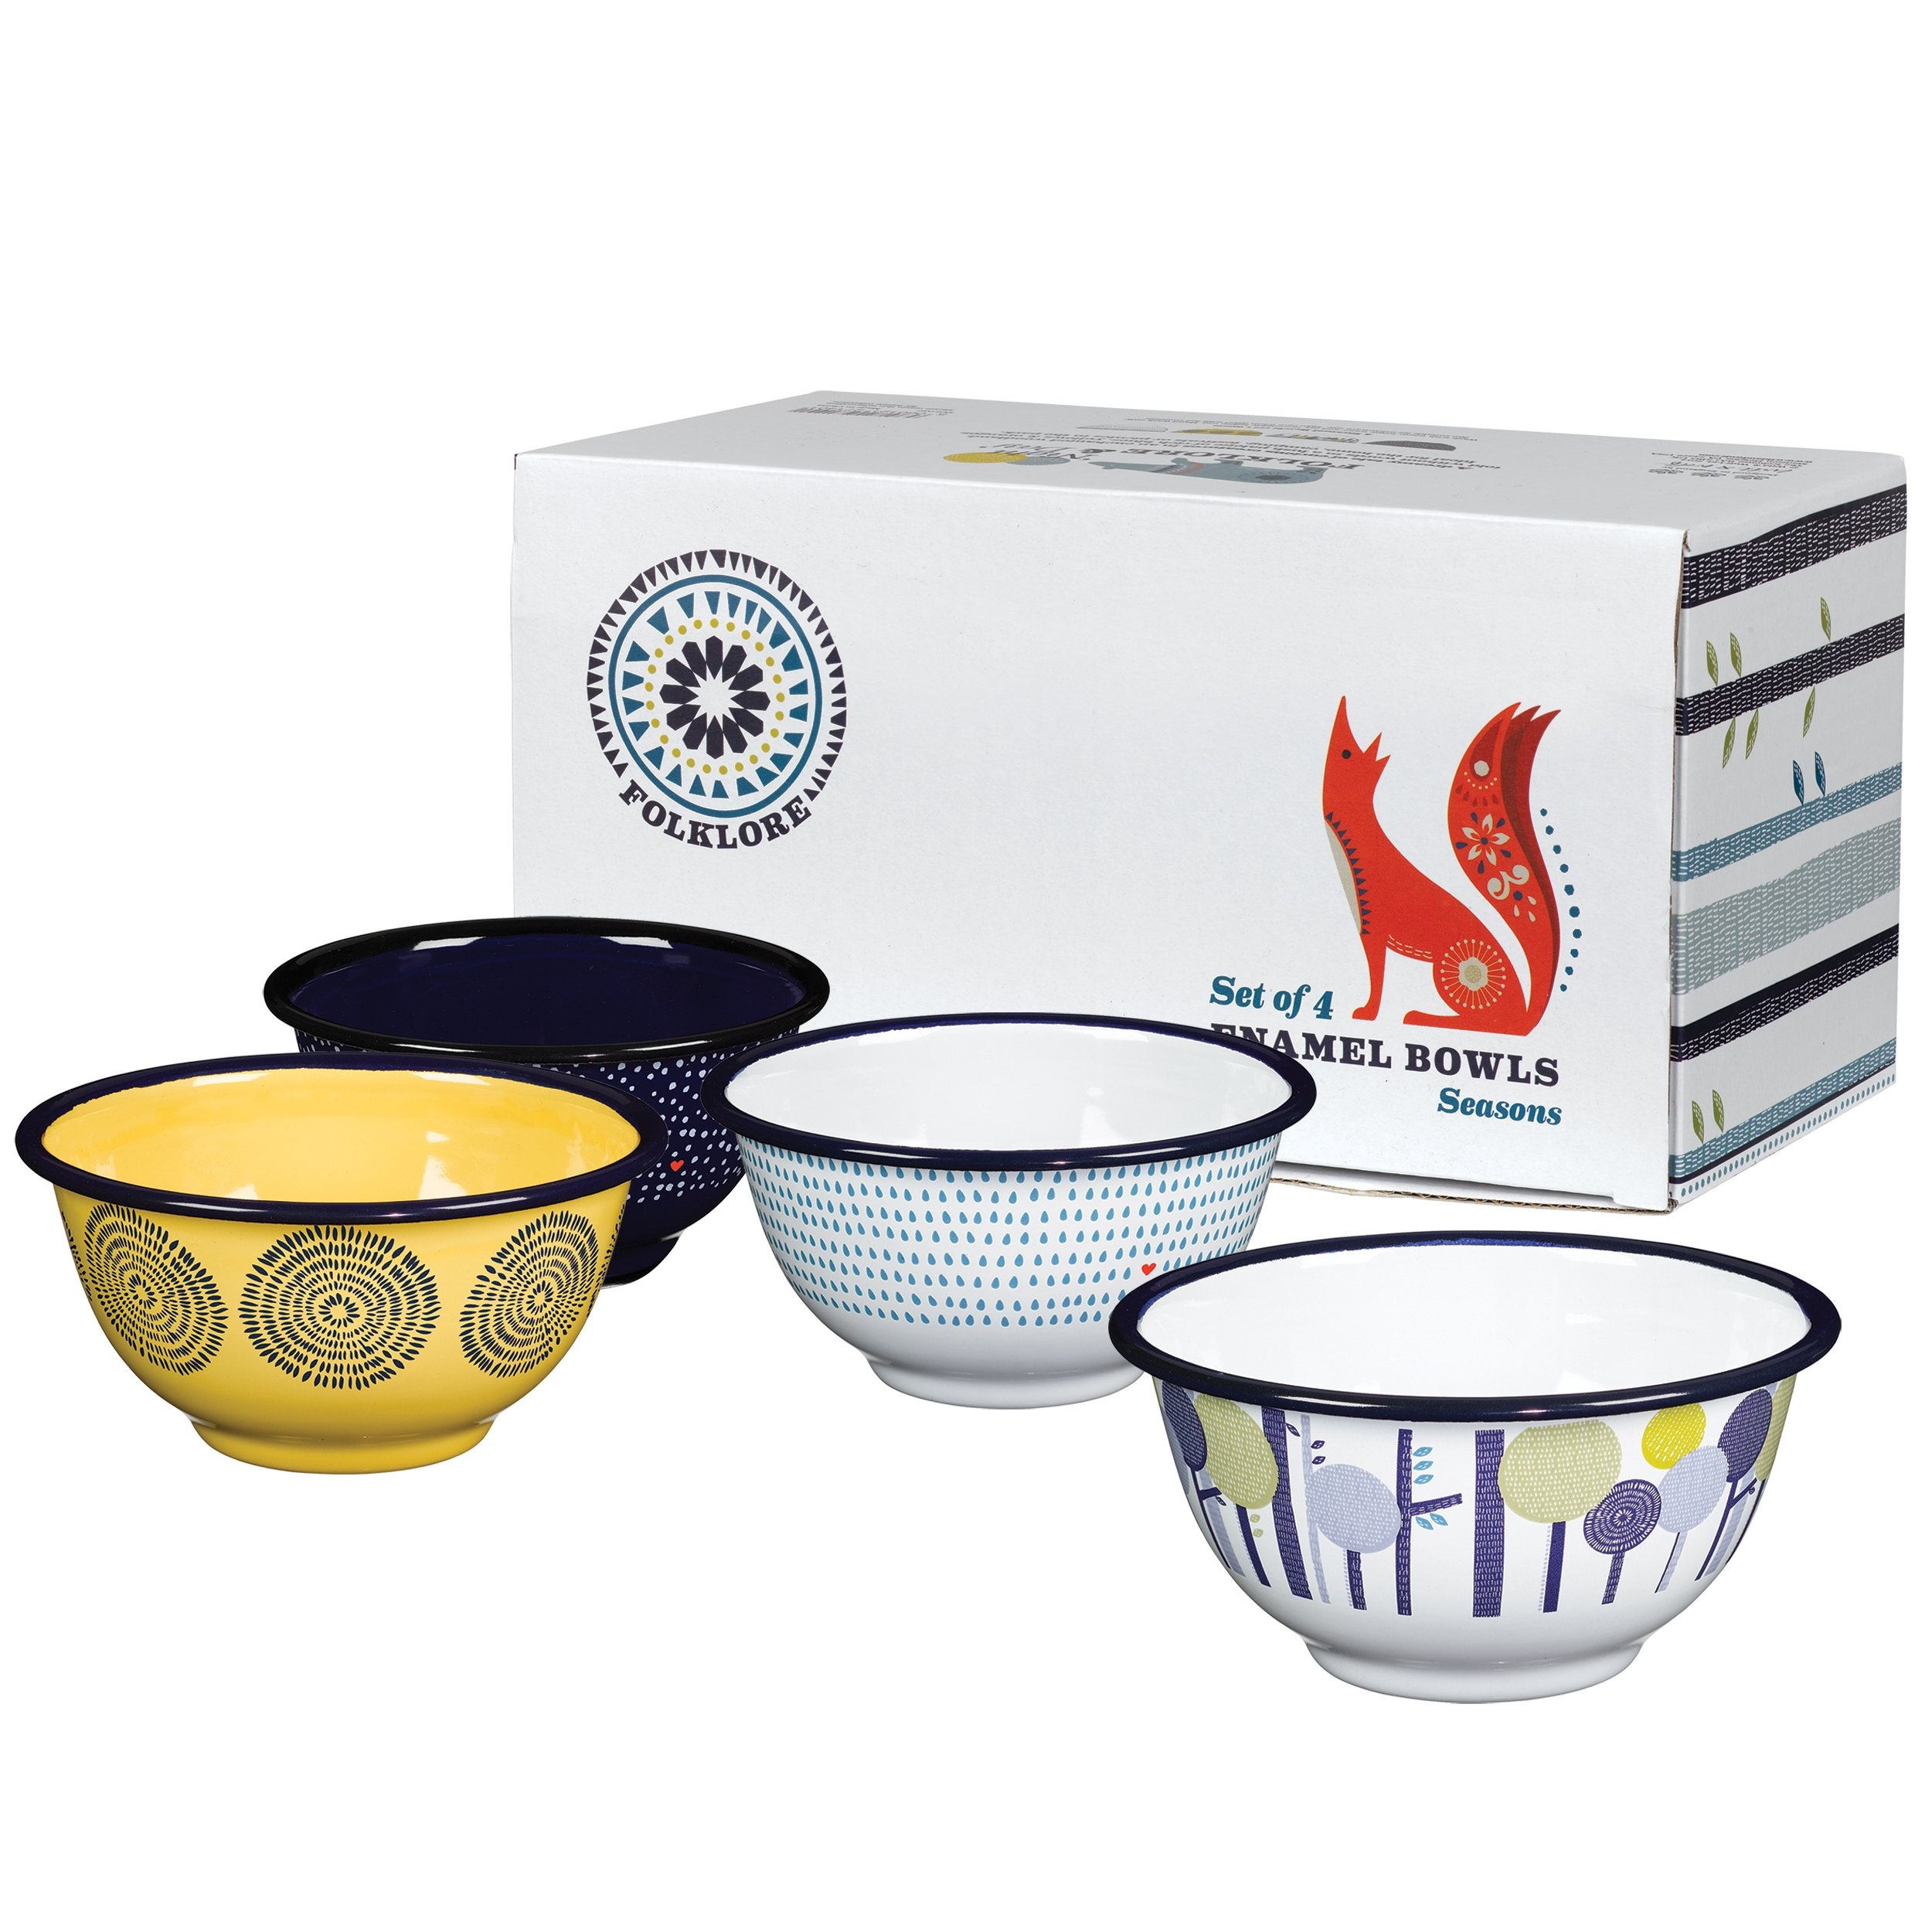 Folklore Enamel Bowls, Seasons Designs (Set of 4)